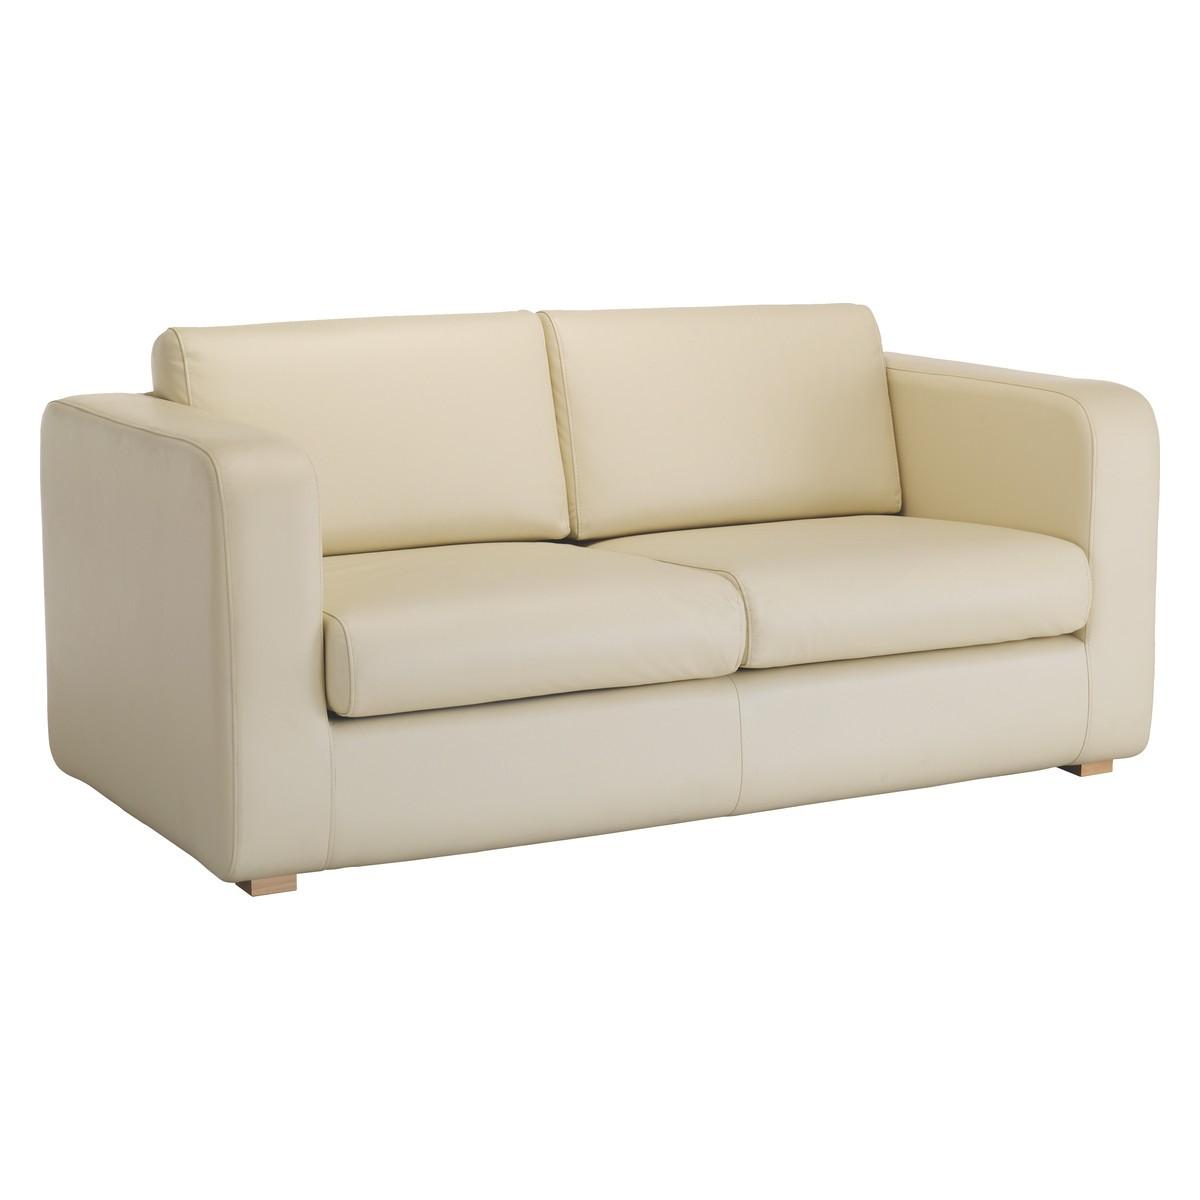 2 seater sofa prevnext ACRLLIK